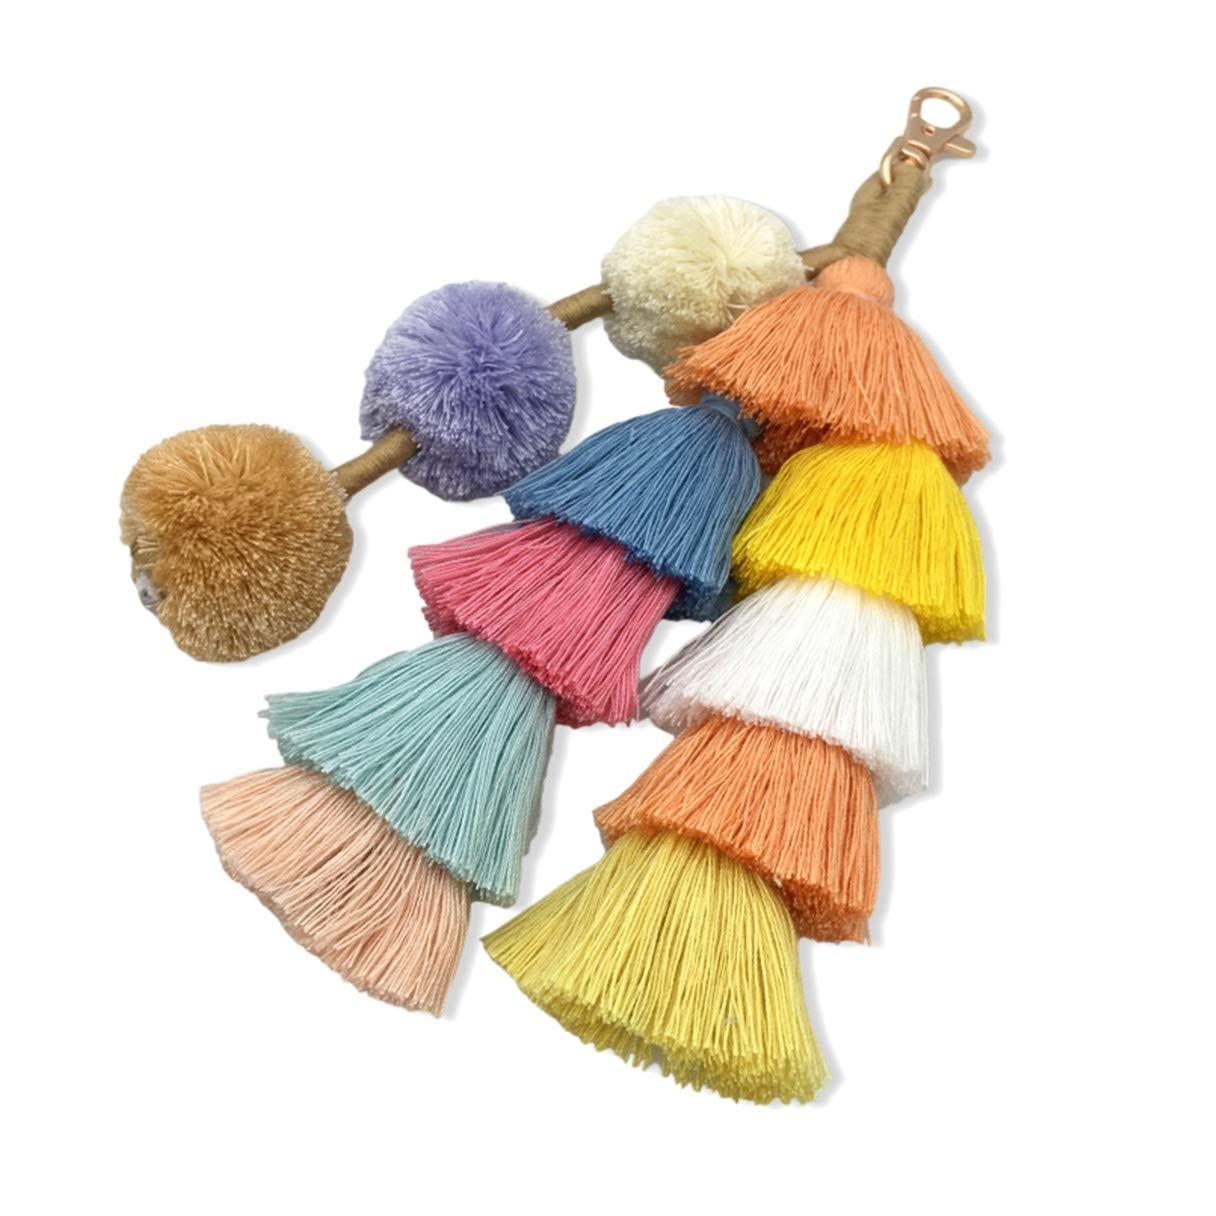 1 Pack Multicolor Cotton Tassel Keyrings Pendants Girls Ball Puff Fur Rabbit Key Chains Grand Popular Pocket Men Bag Car Keychain